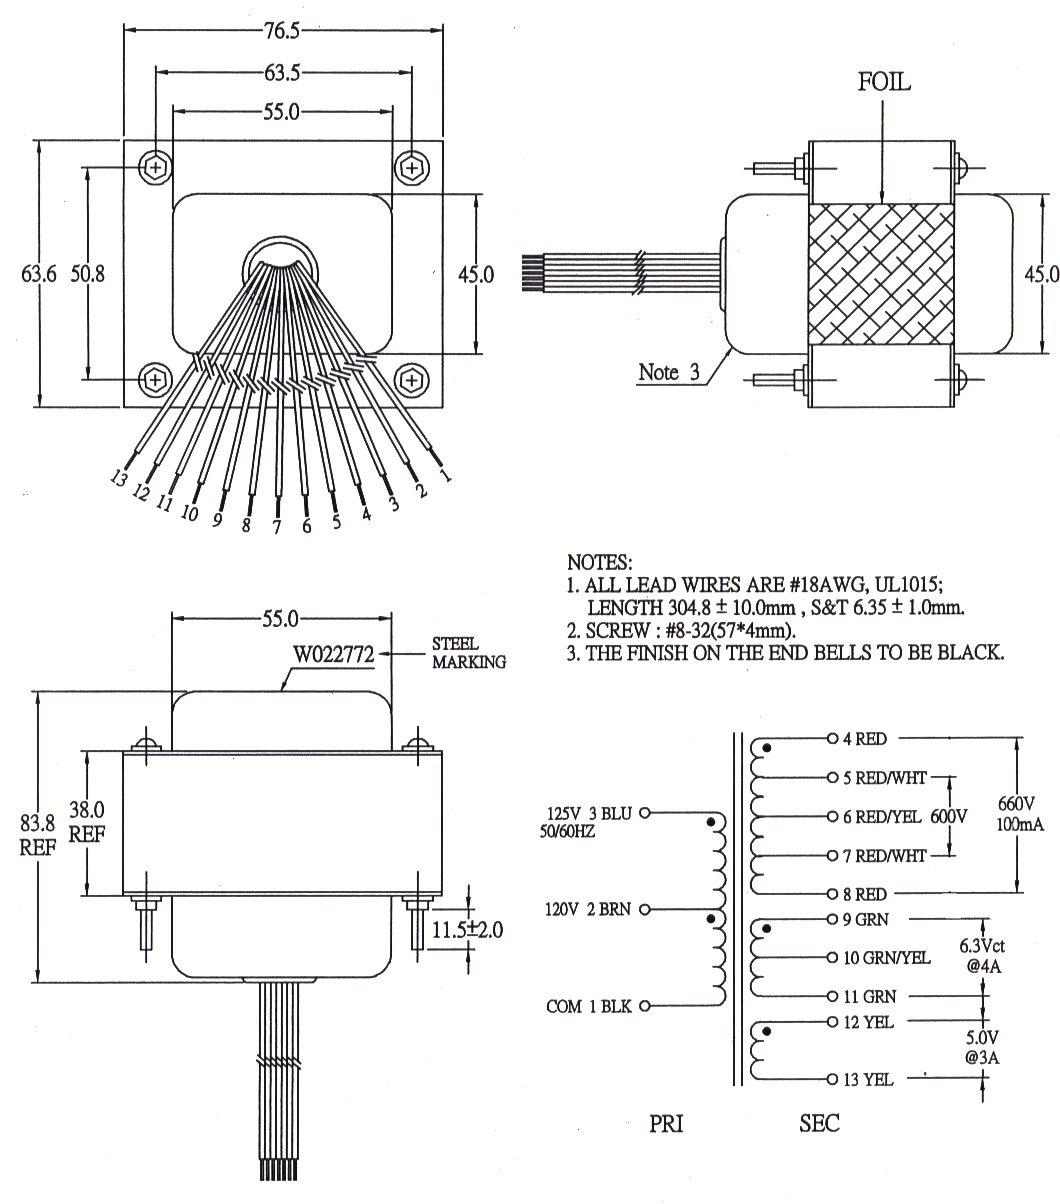 w022772sch Weber Wiring Diagrams on weber display, weber contrast, weber filter,